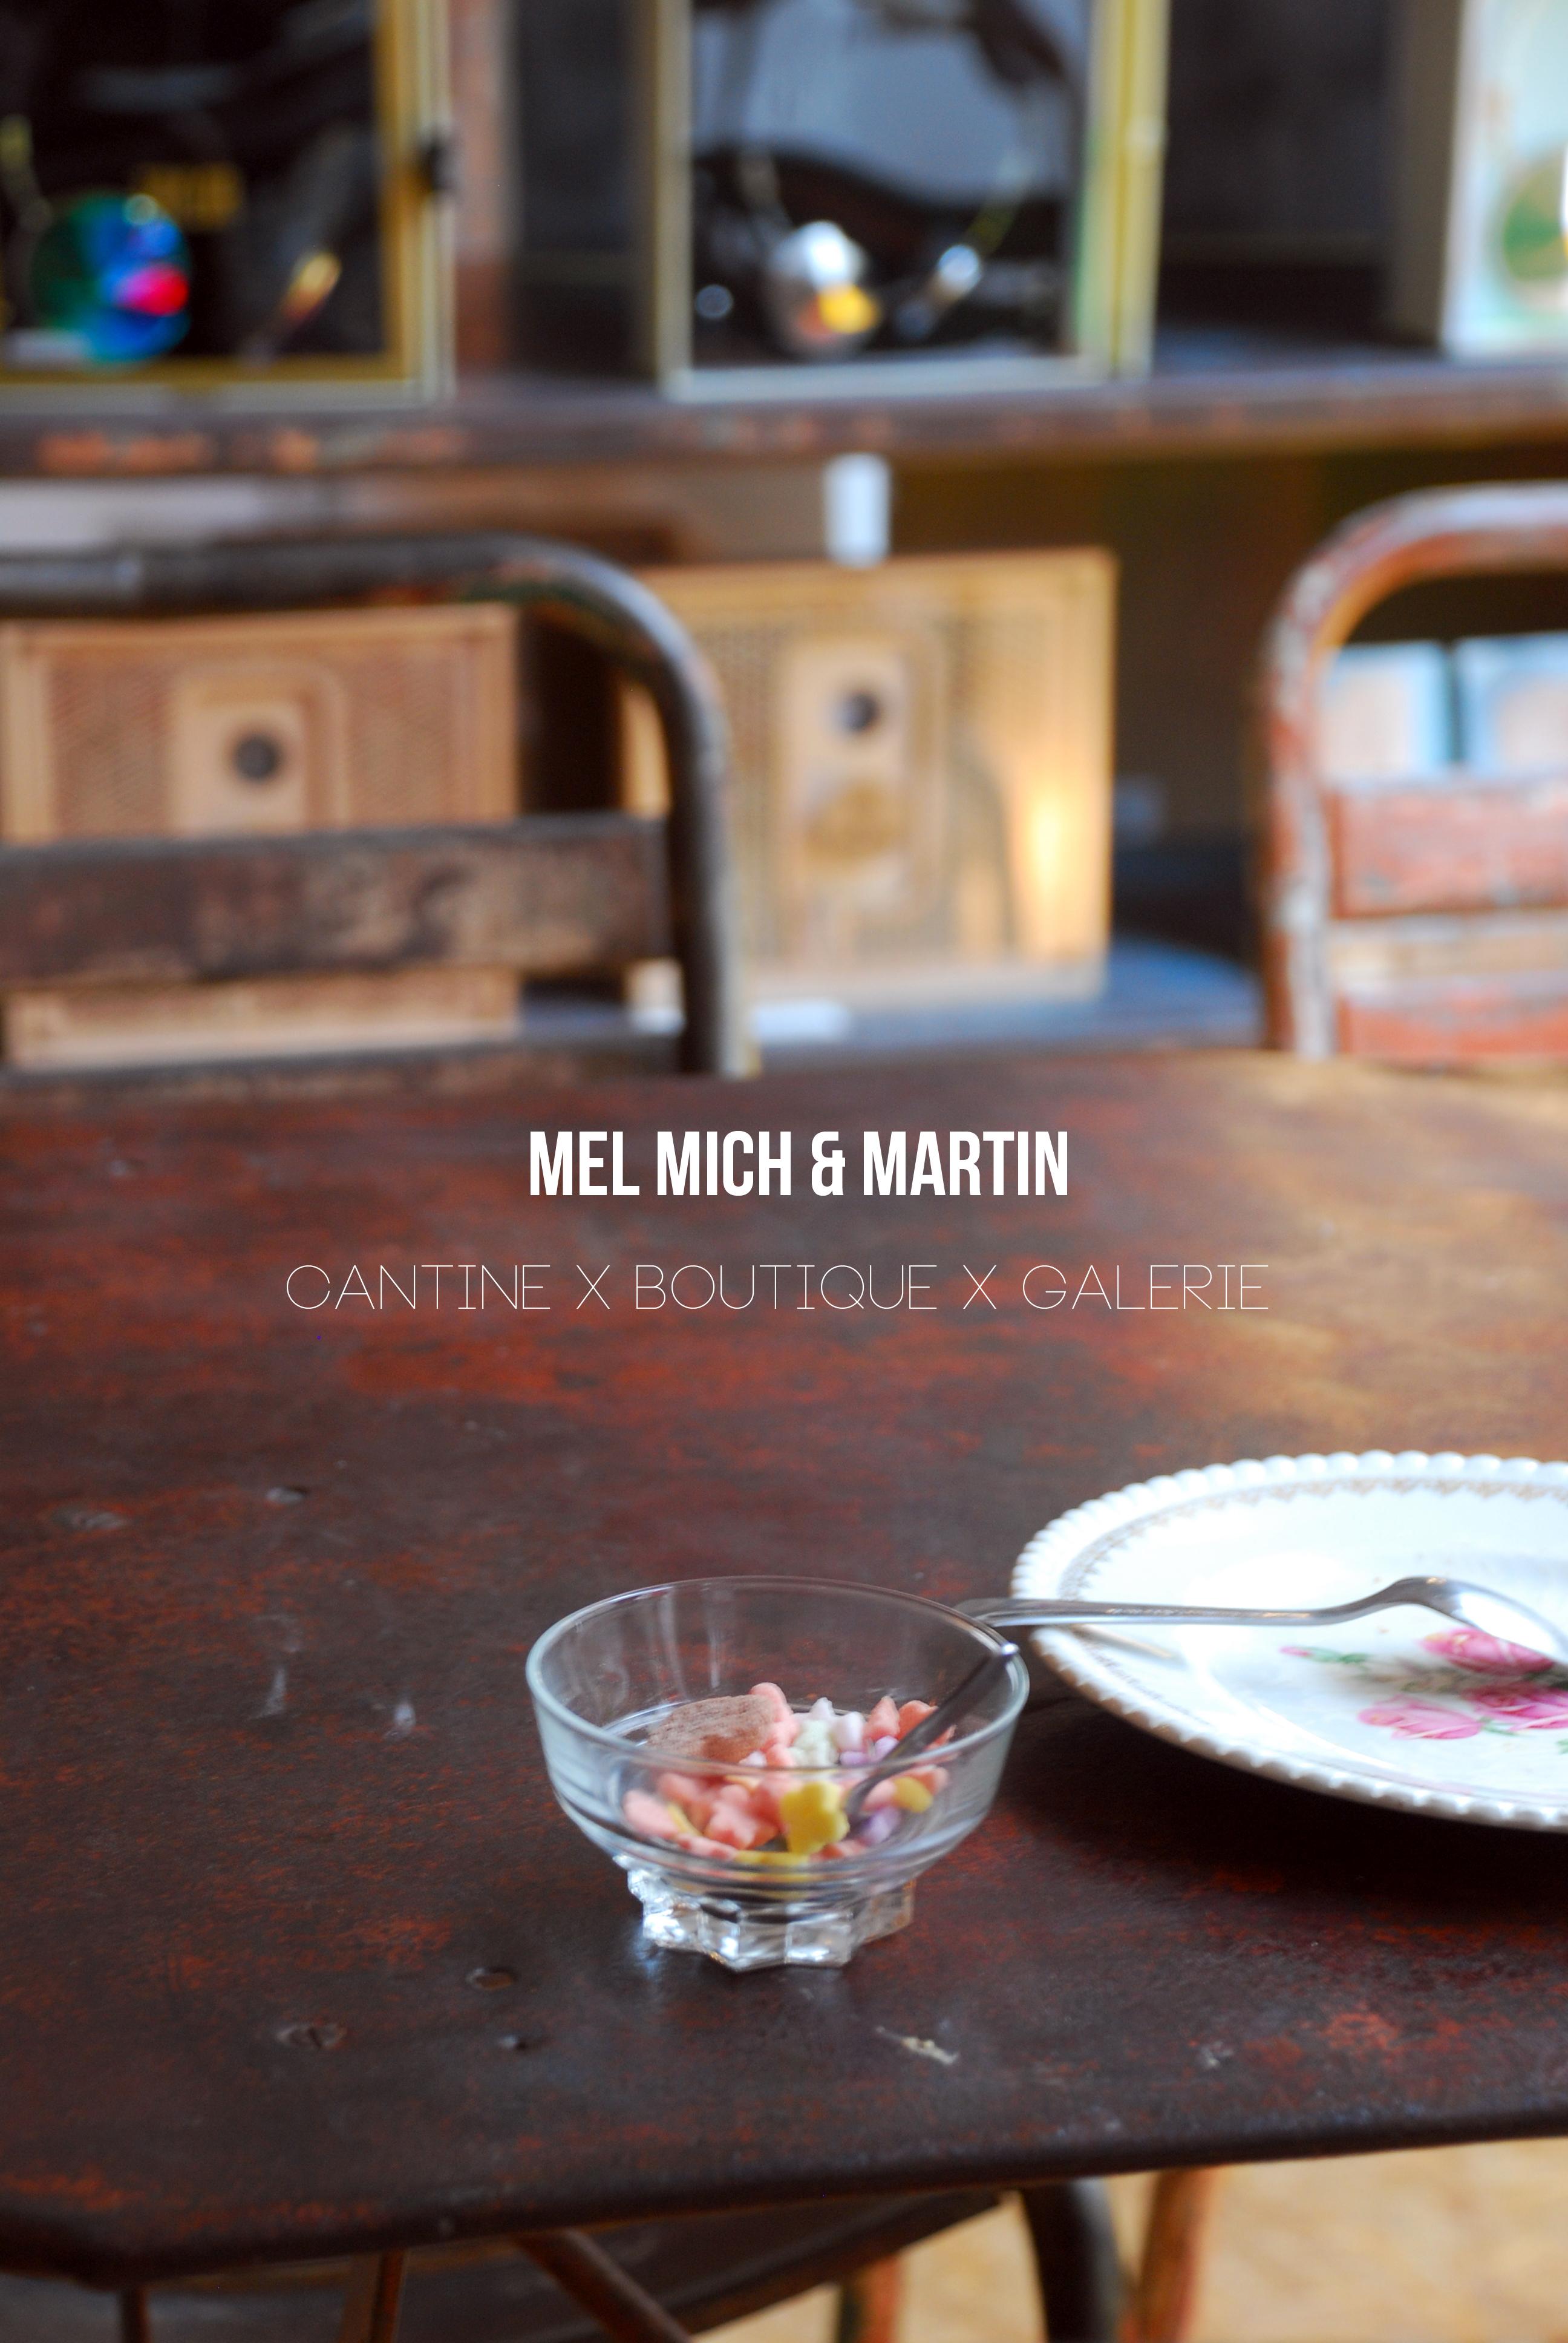 mel-mich-martin-cantine-boutique-galerie-paris-11-by-le-polyedre_5